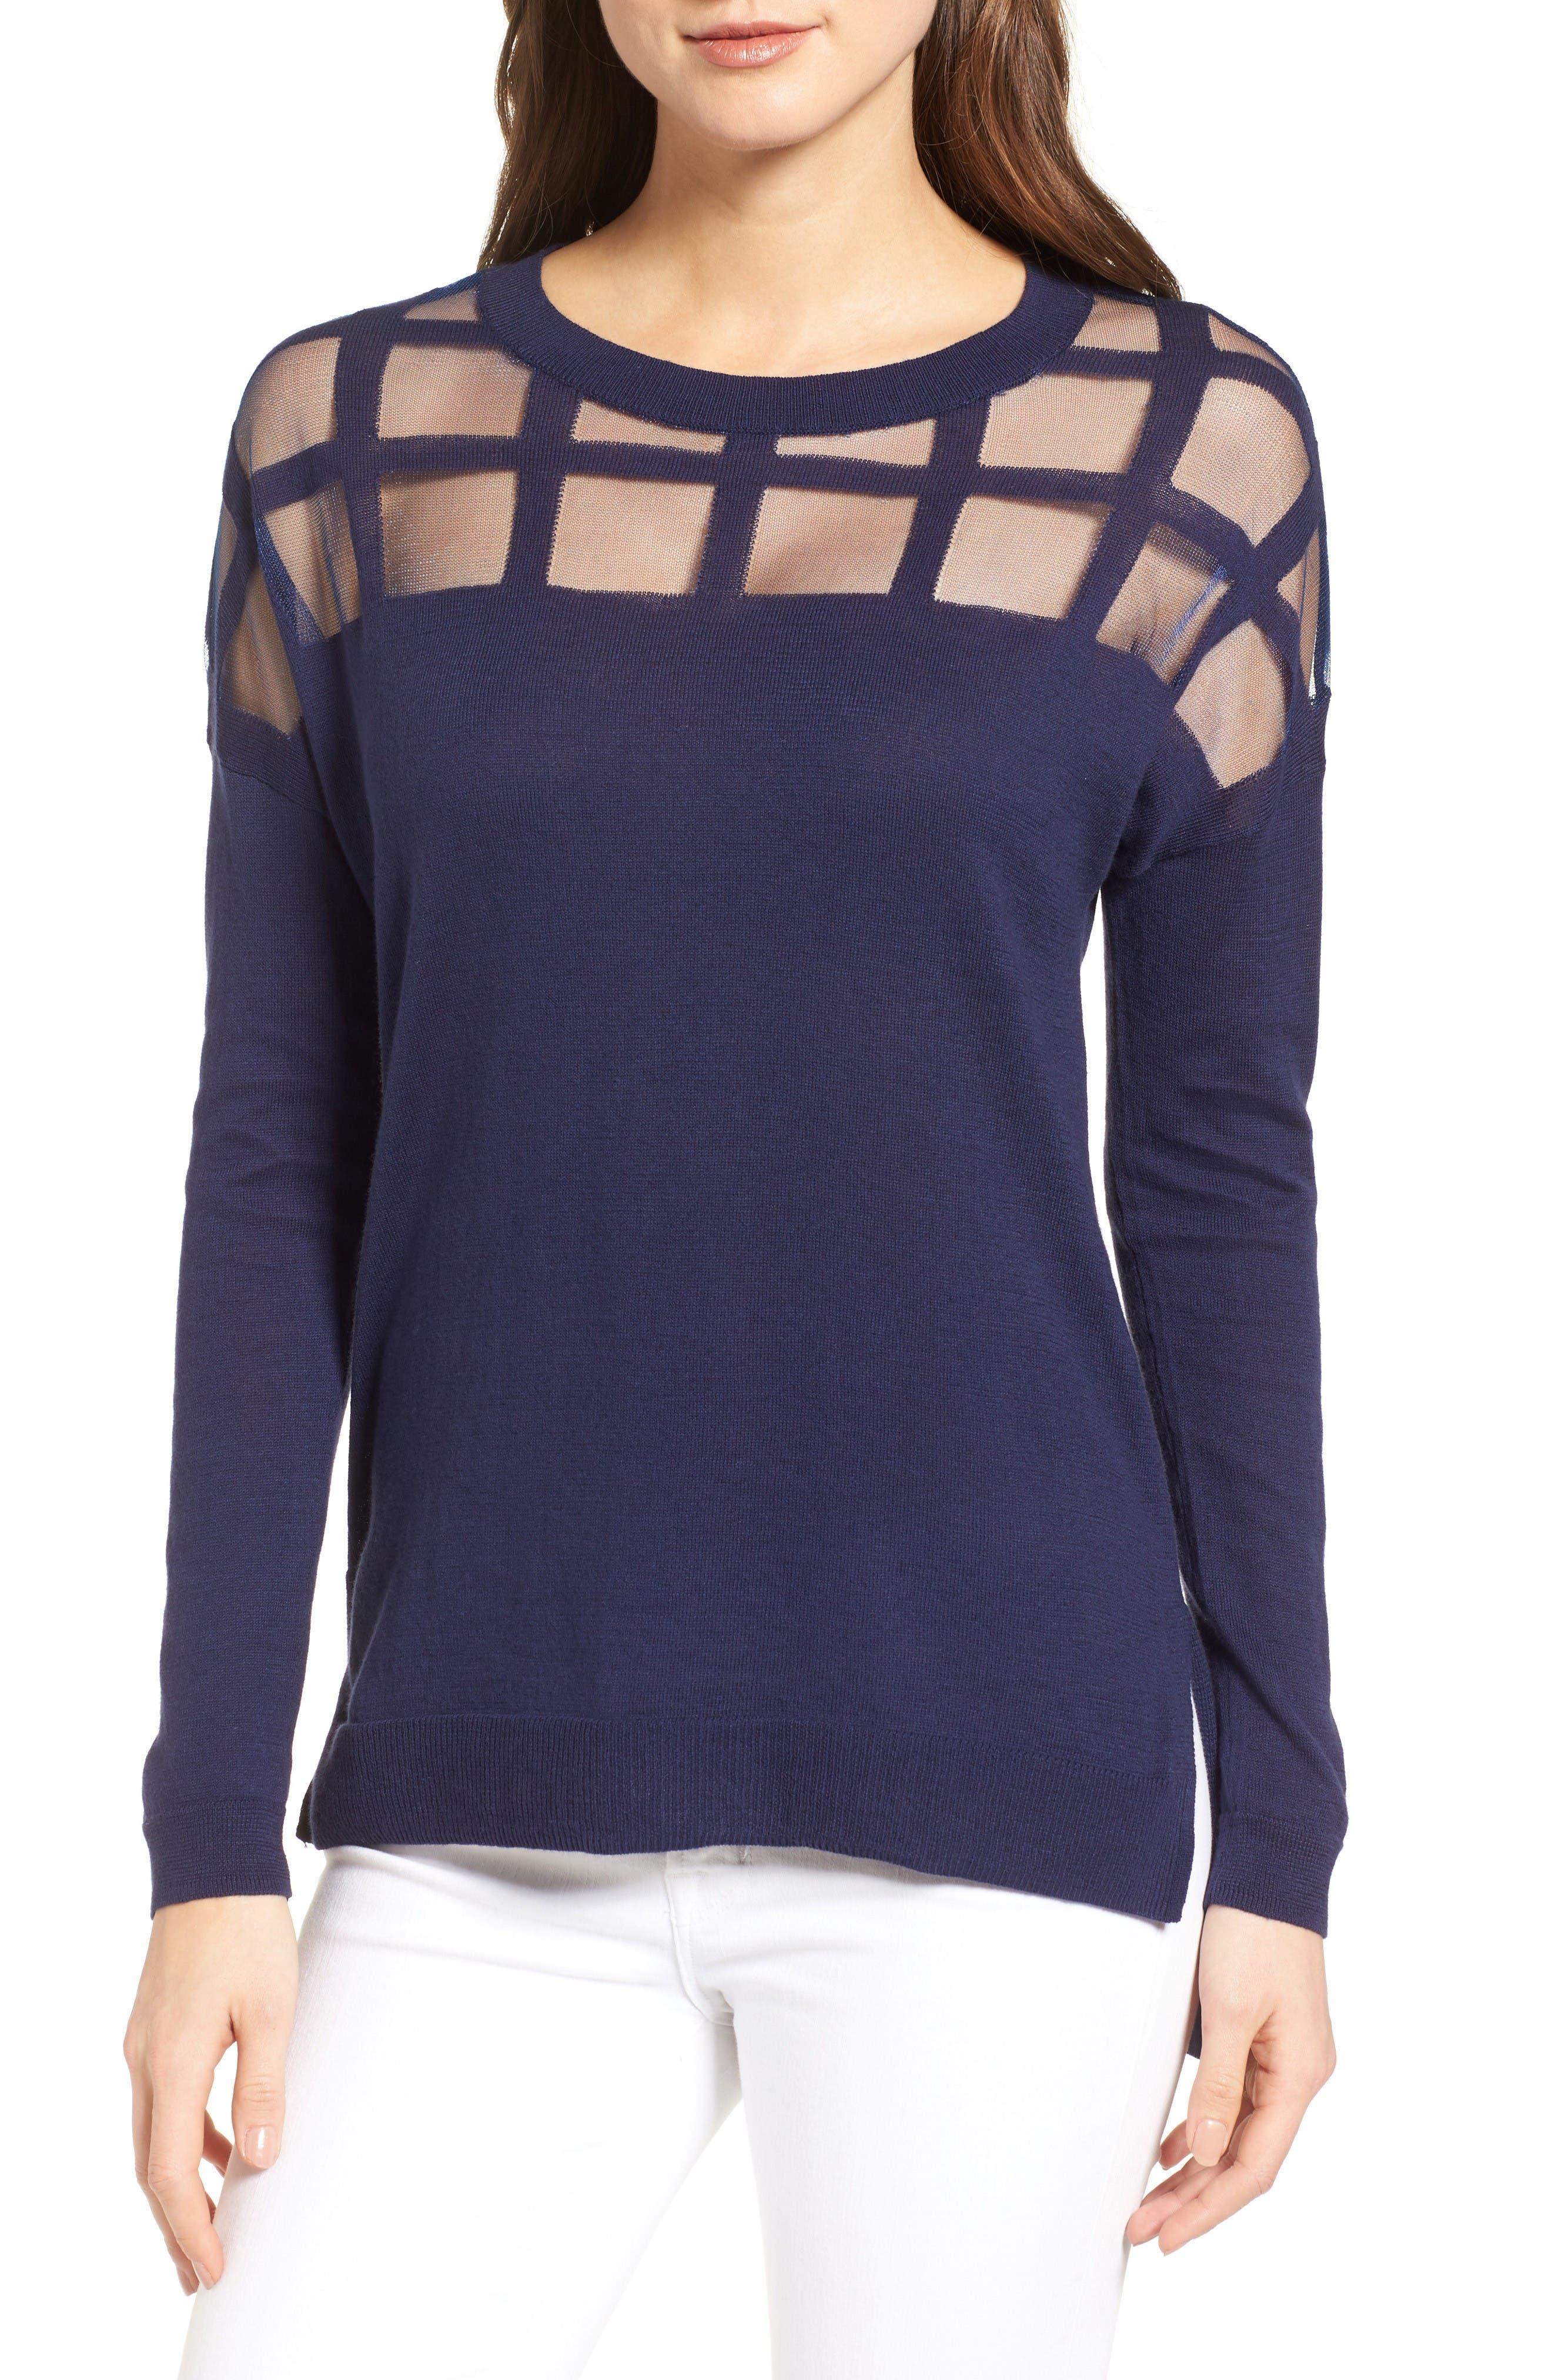 Alternate Image 1 Selected - Trouvé Sheer Grid Yoke Sweater